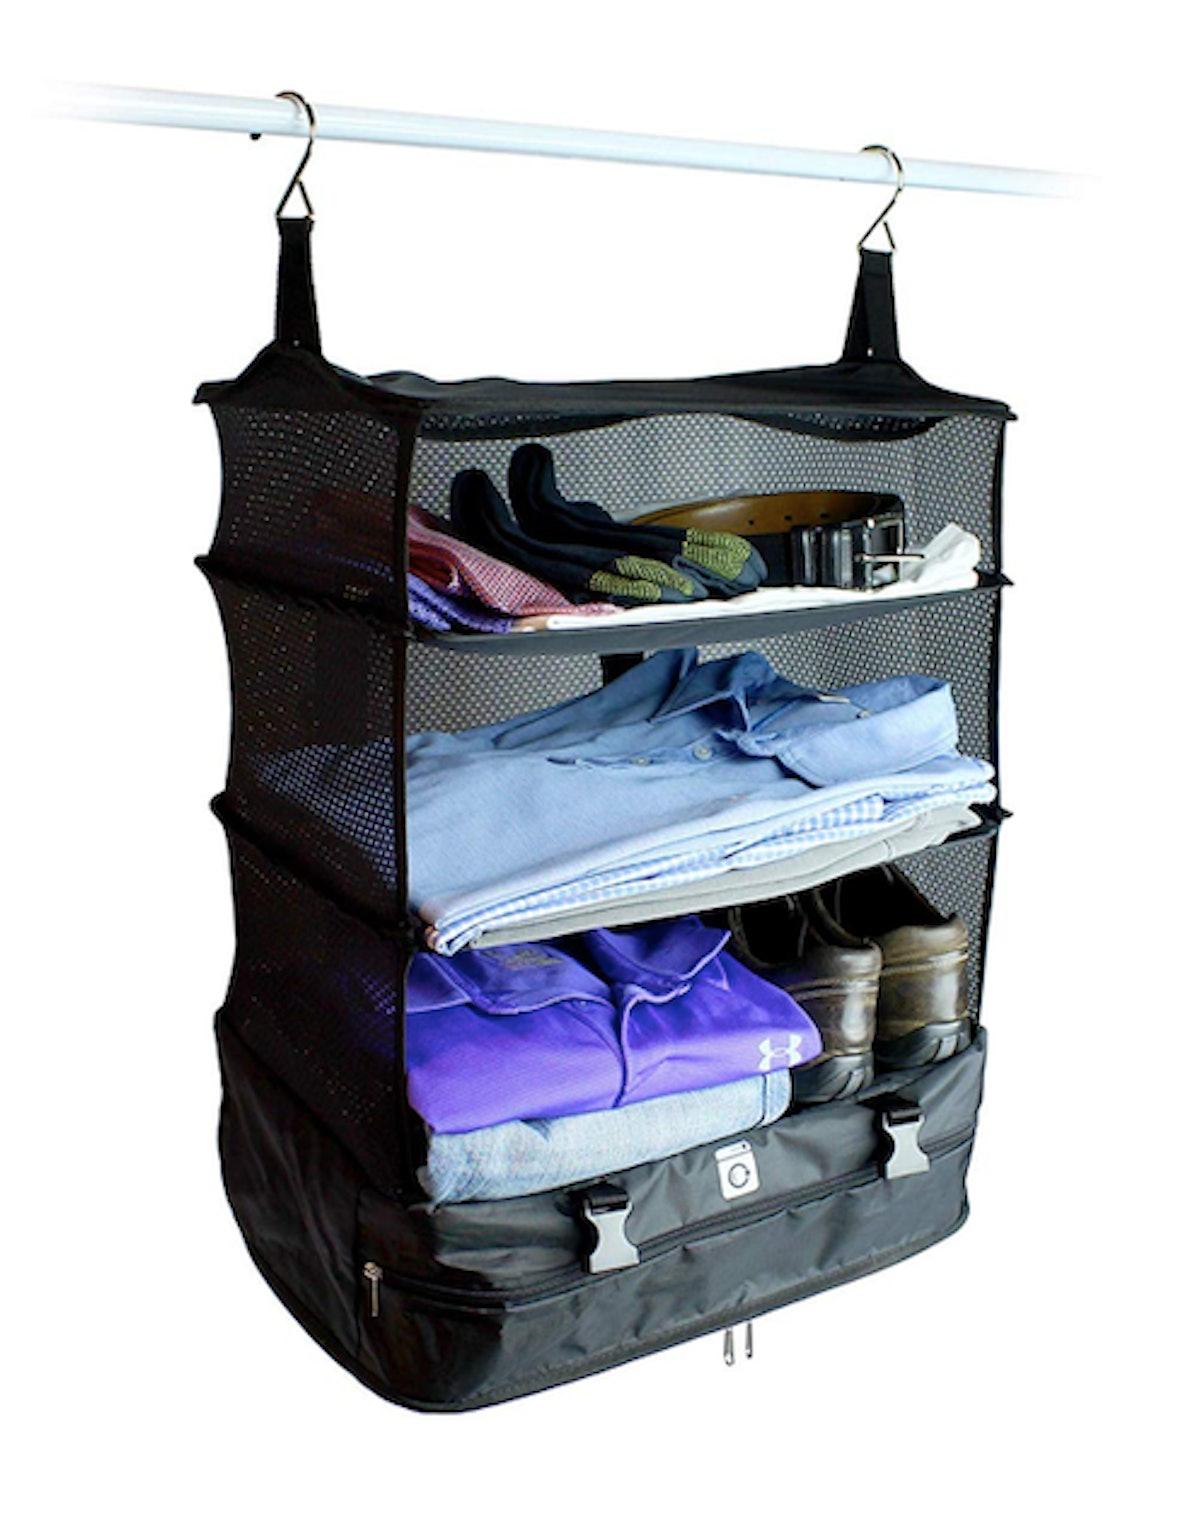 Stow-N-Go Portable Suitcase Organizer